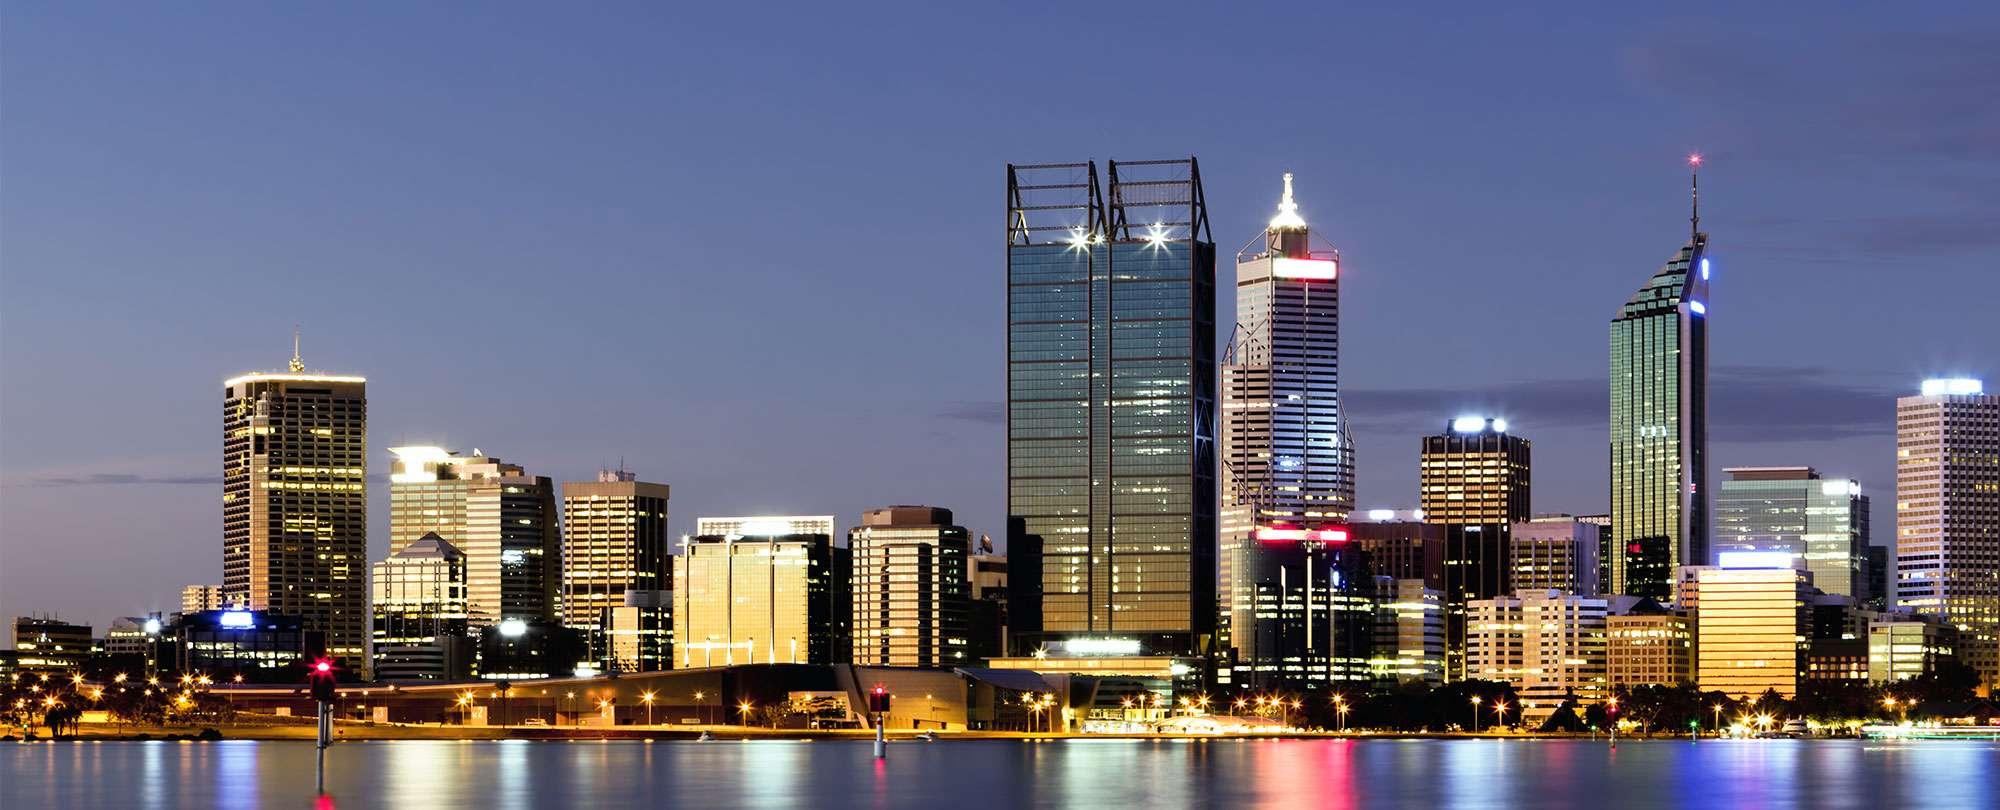 Perth-City1